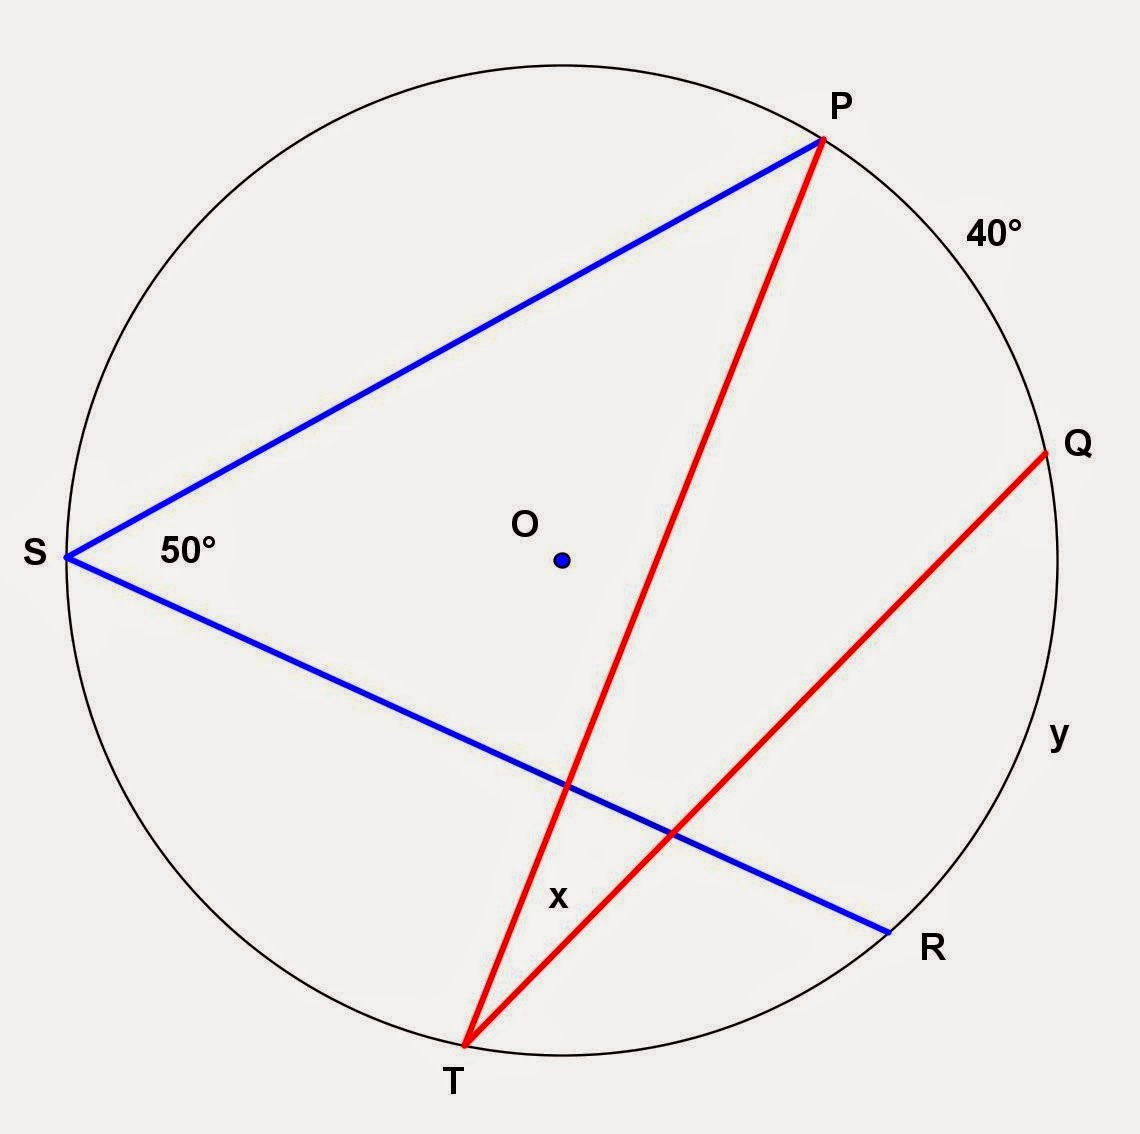 Math Principles Circle And Inscribed Angle Problems